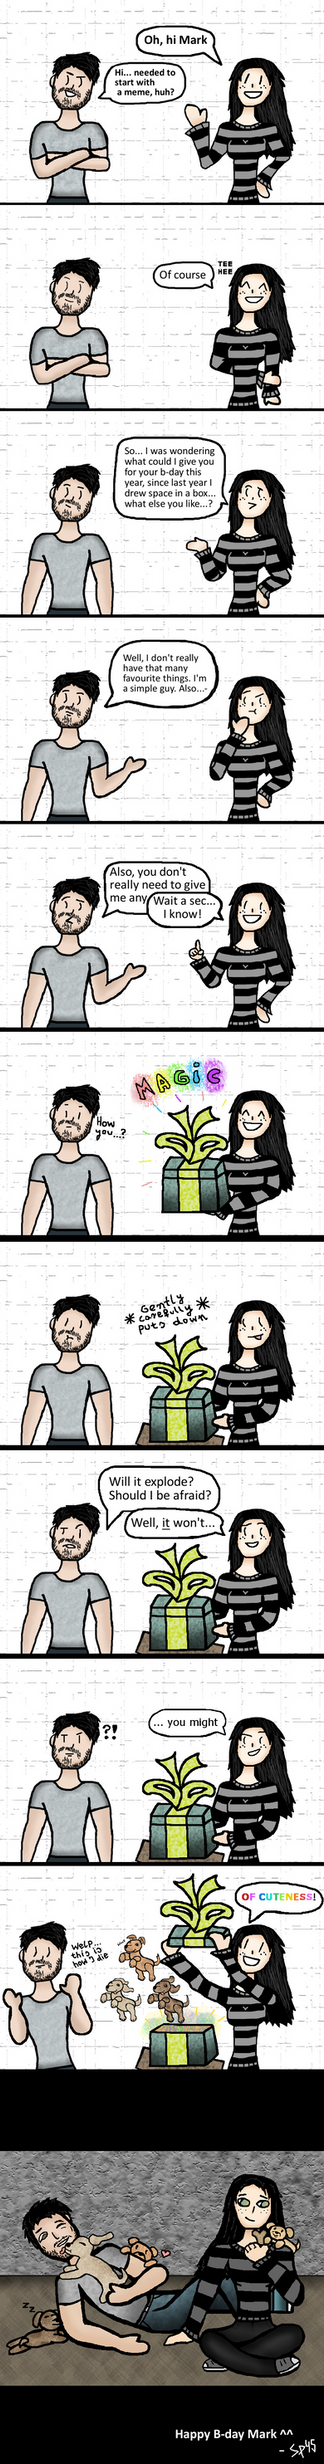 Happy B-day Mark ^^  I 2018 comics I by SpookyMuffin4545